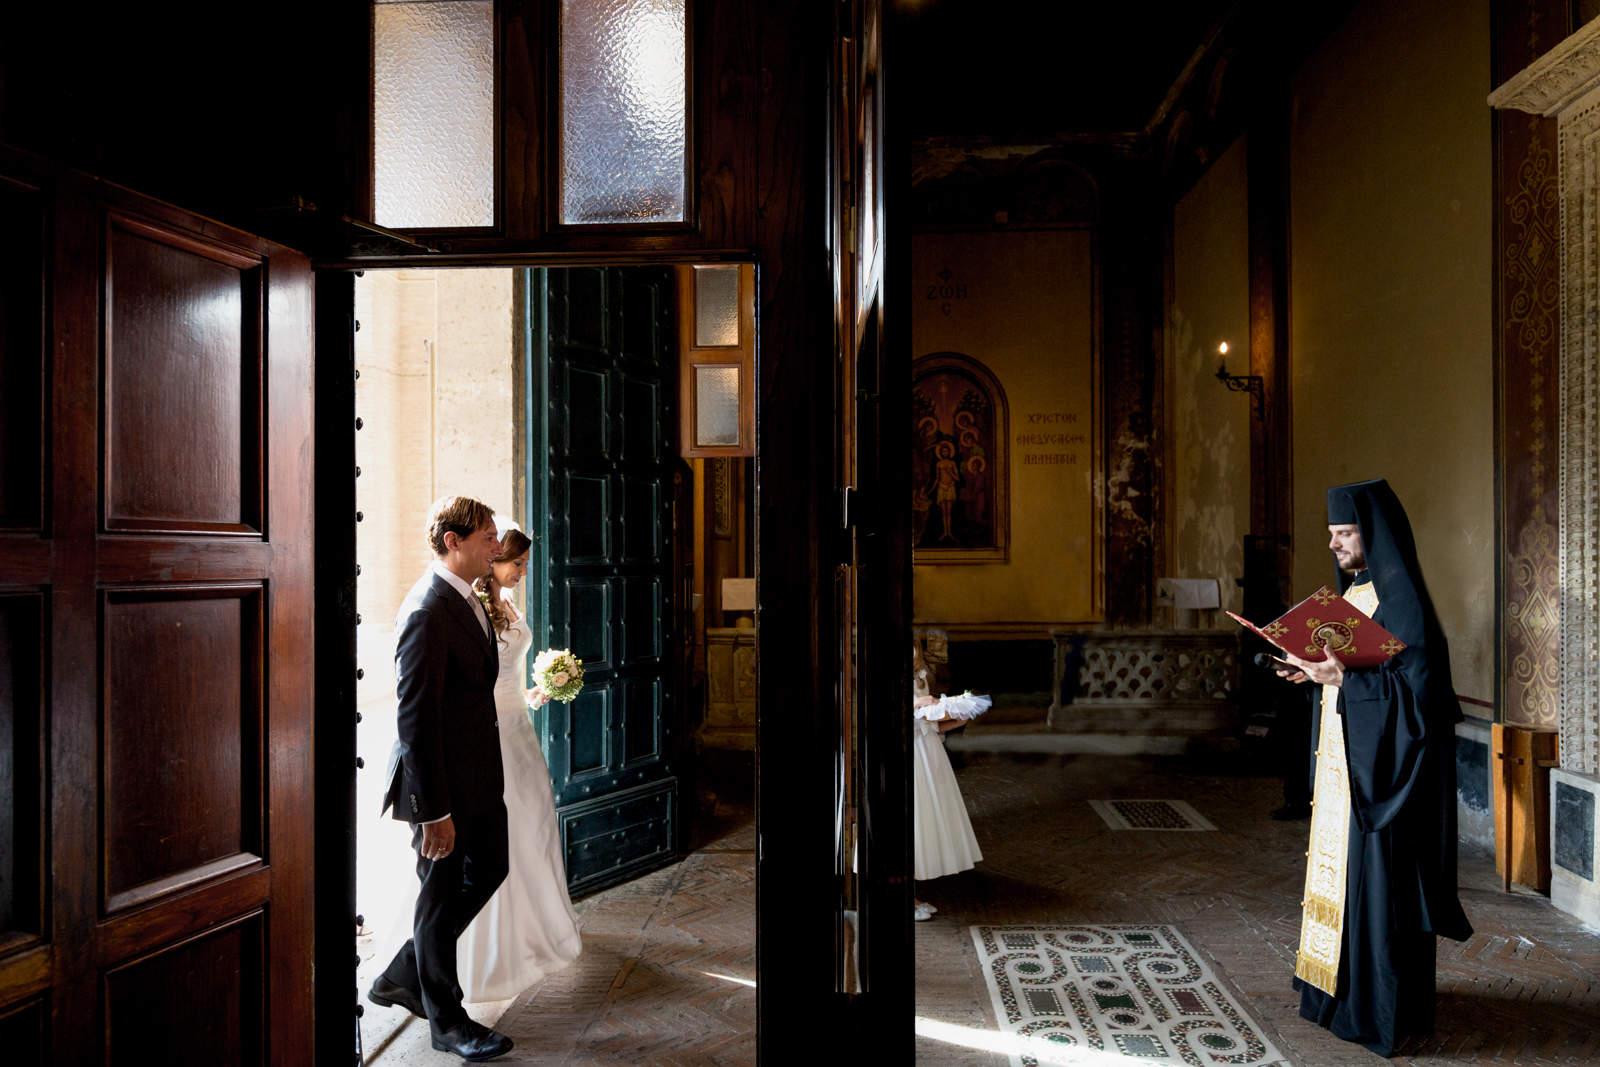 22 - Matrimonio a Grottaferrata